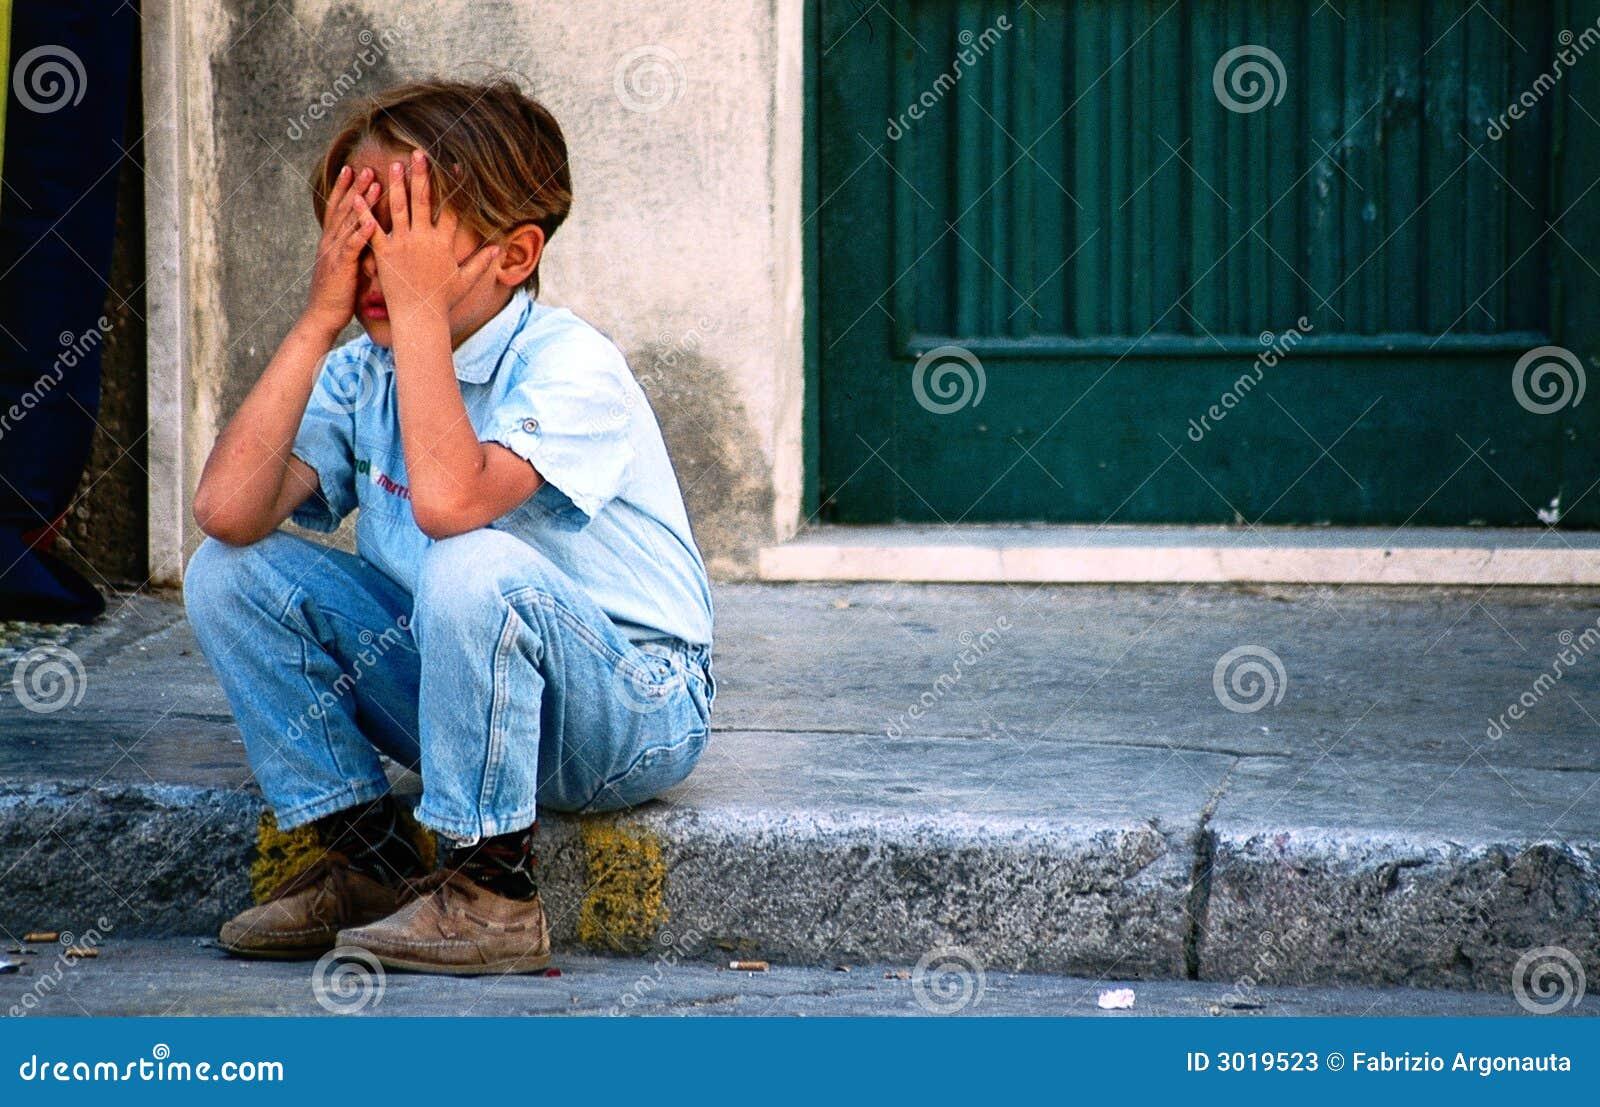 Enfant désespéré